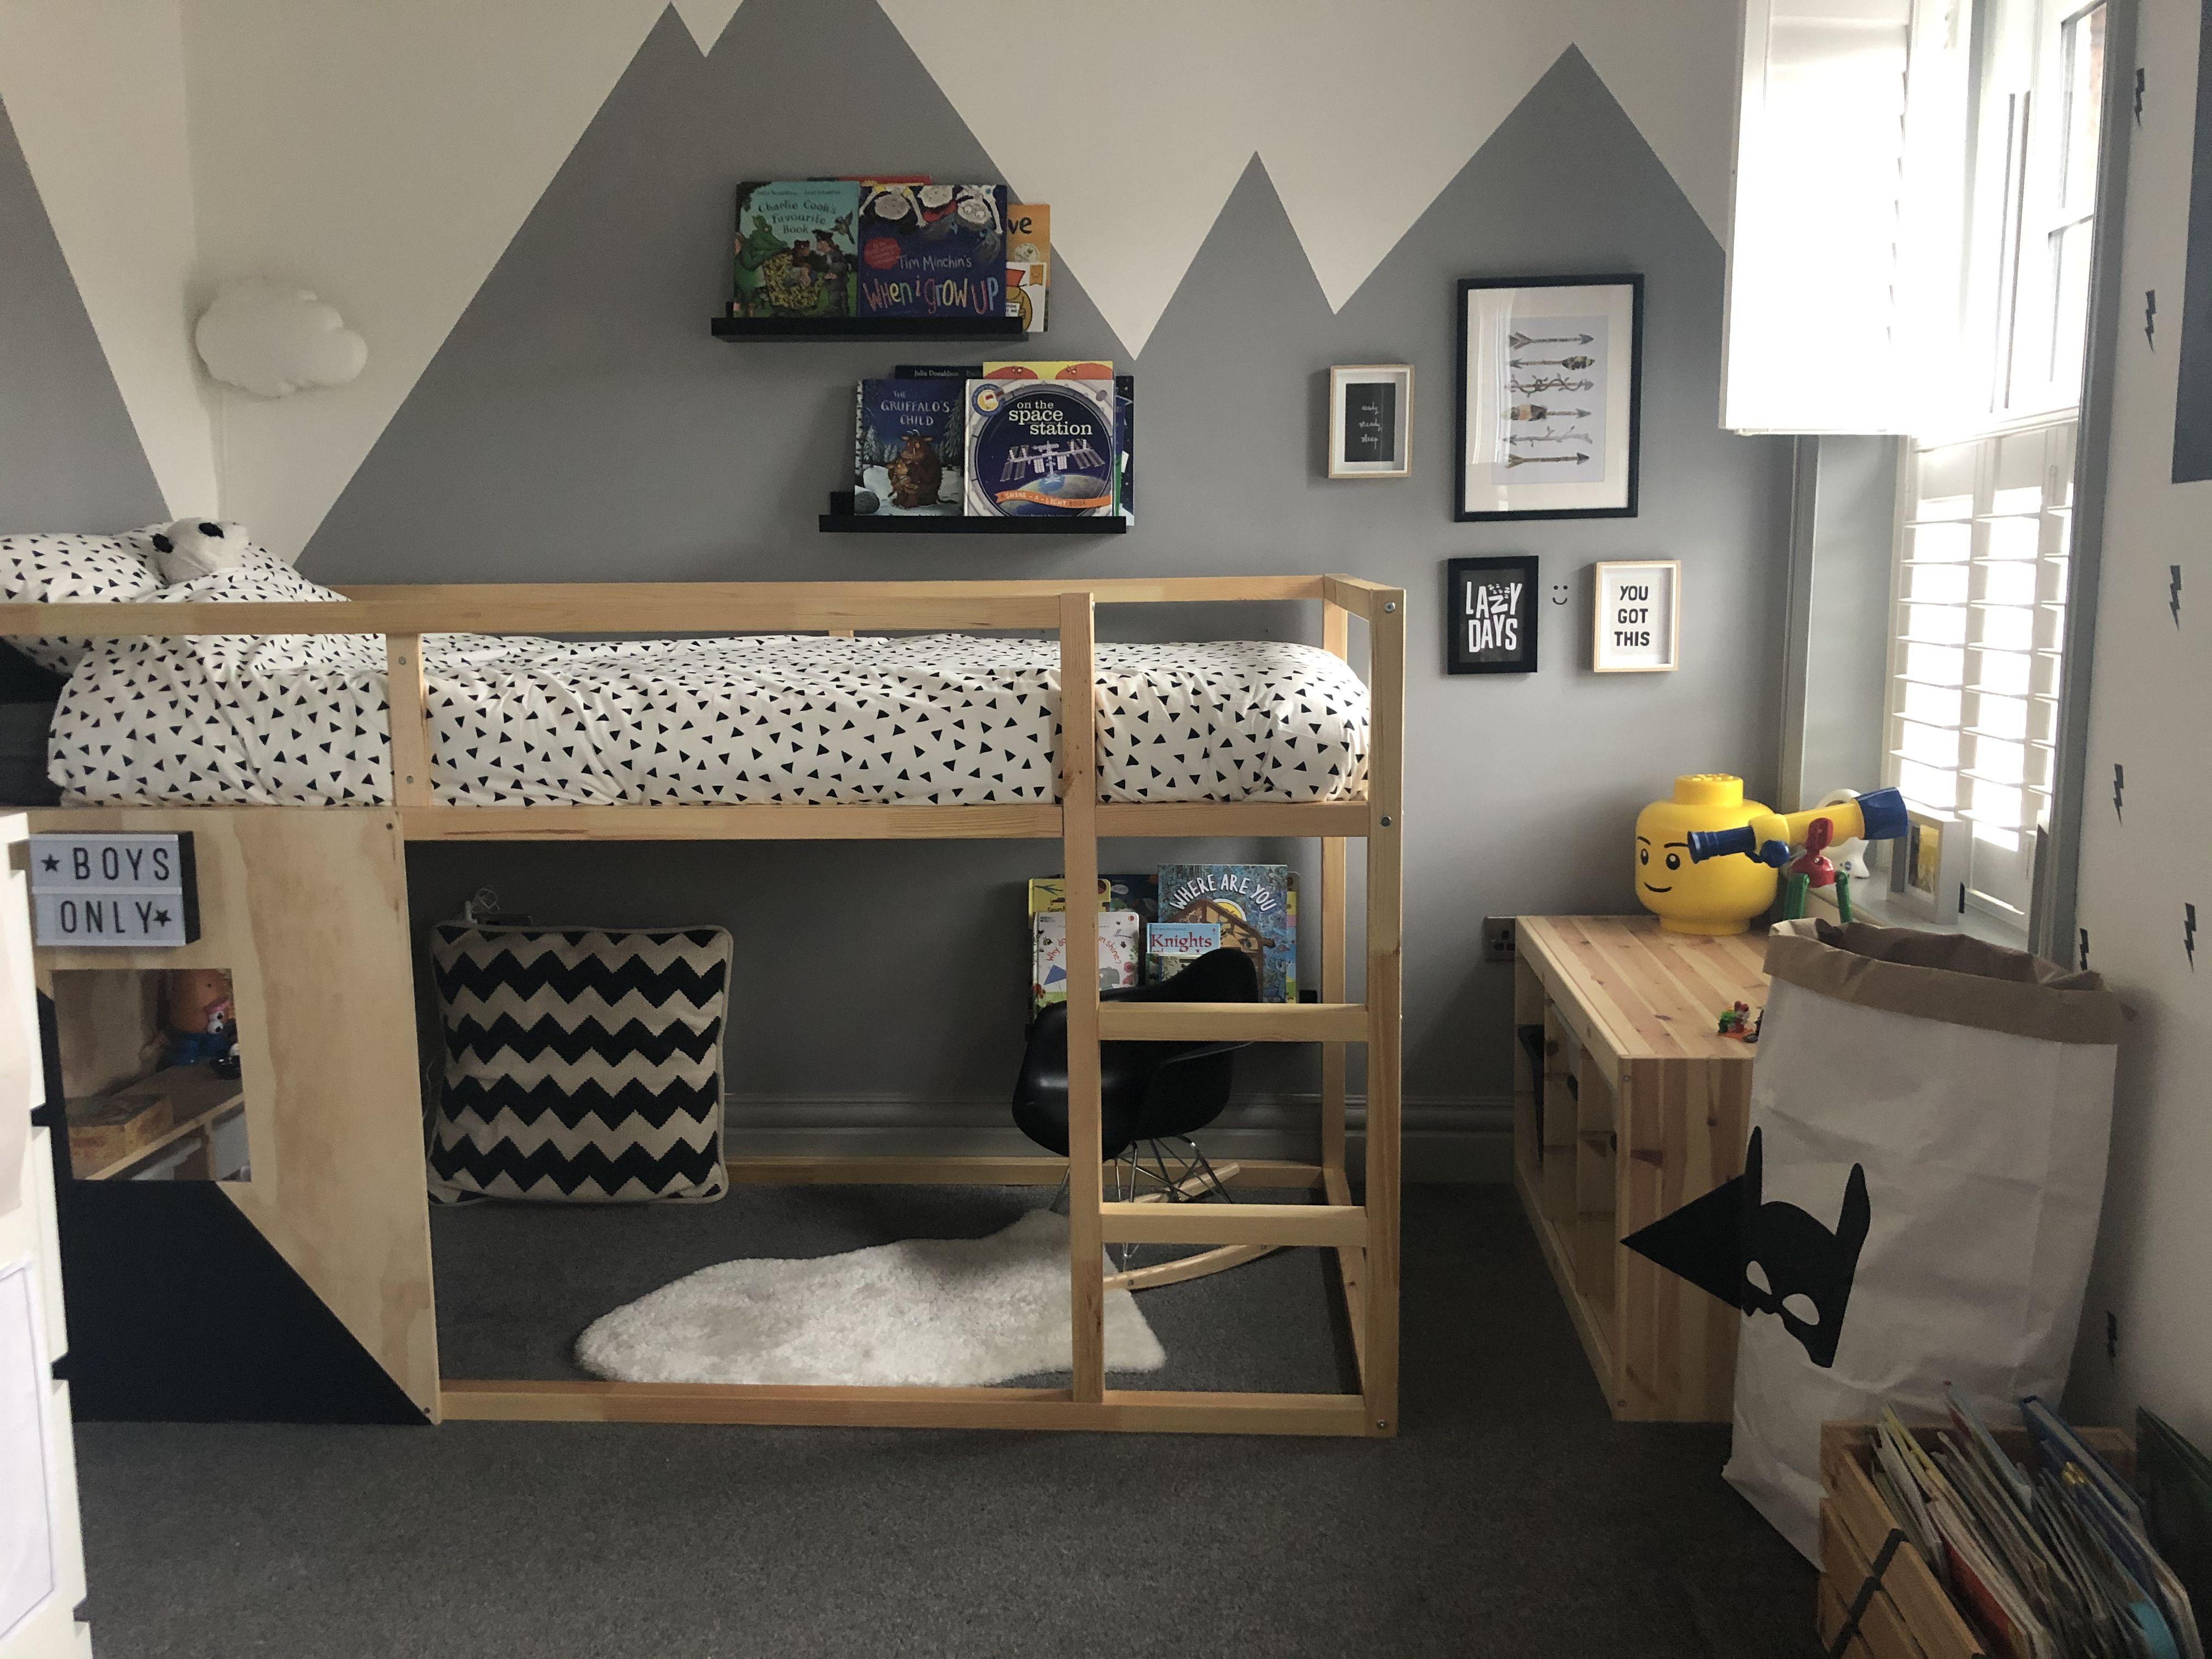 Ikea Kura Bed Monochrome Ikea Kura Bed Toddler Boy Room Decor Kura Bed